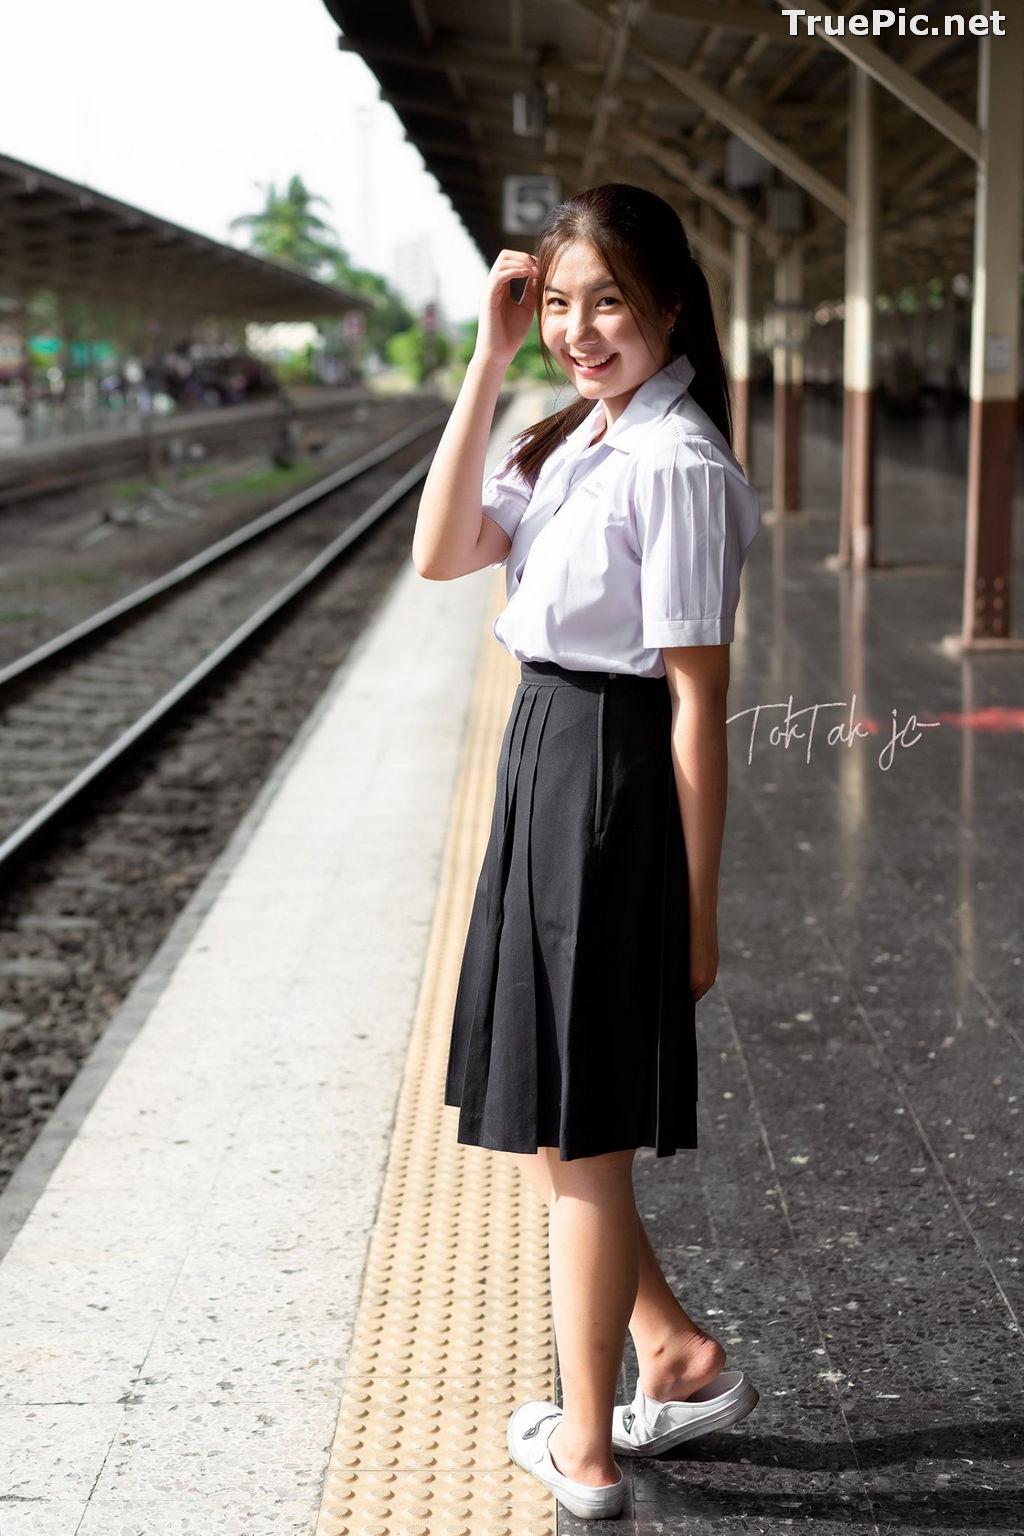 Image Thailand Model - Kornrawee Chokejindachai - Cute Student Girl - TruePic.net - Picture-7